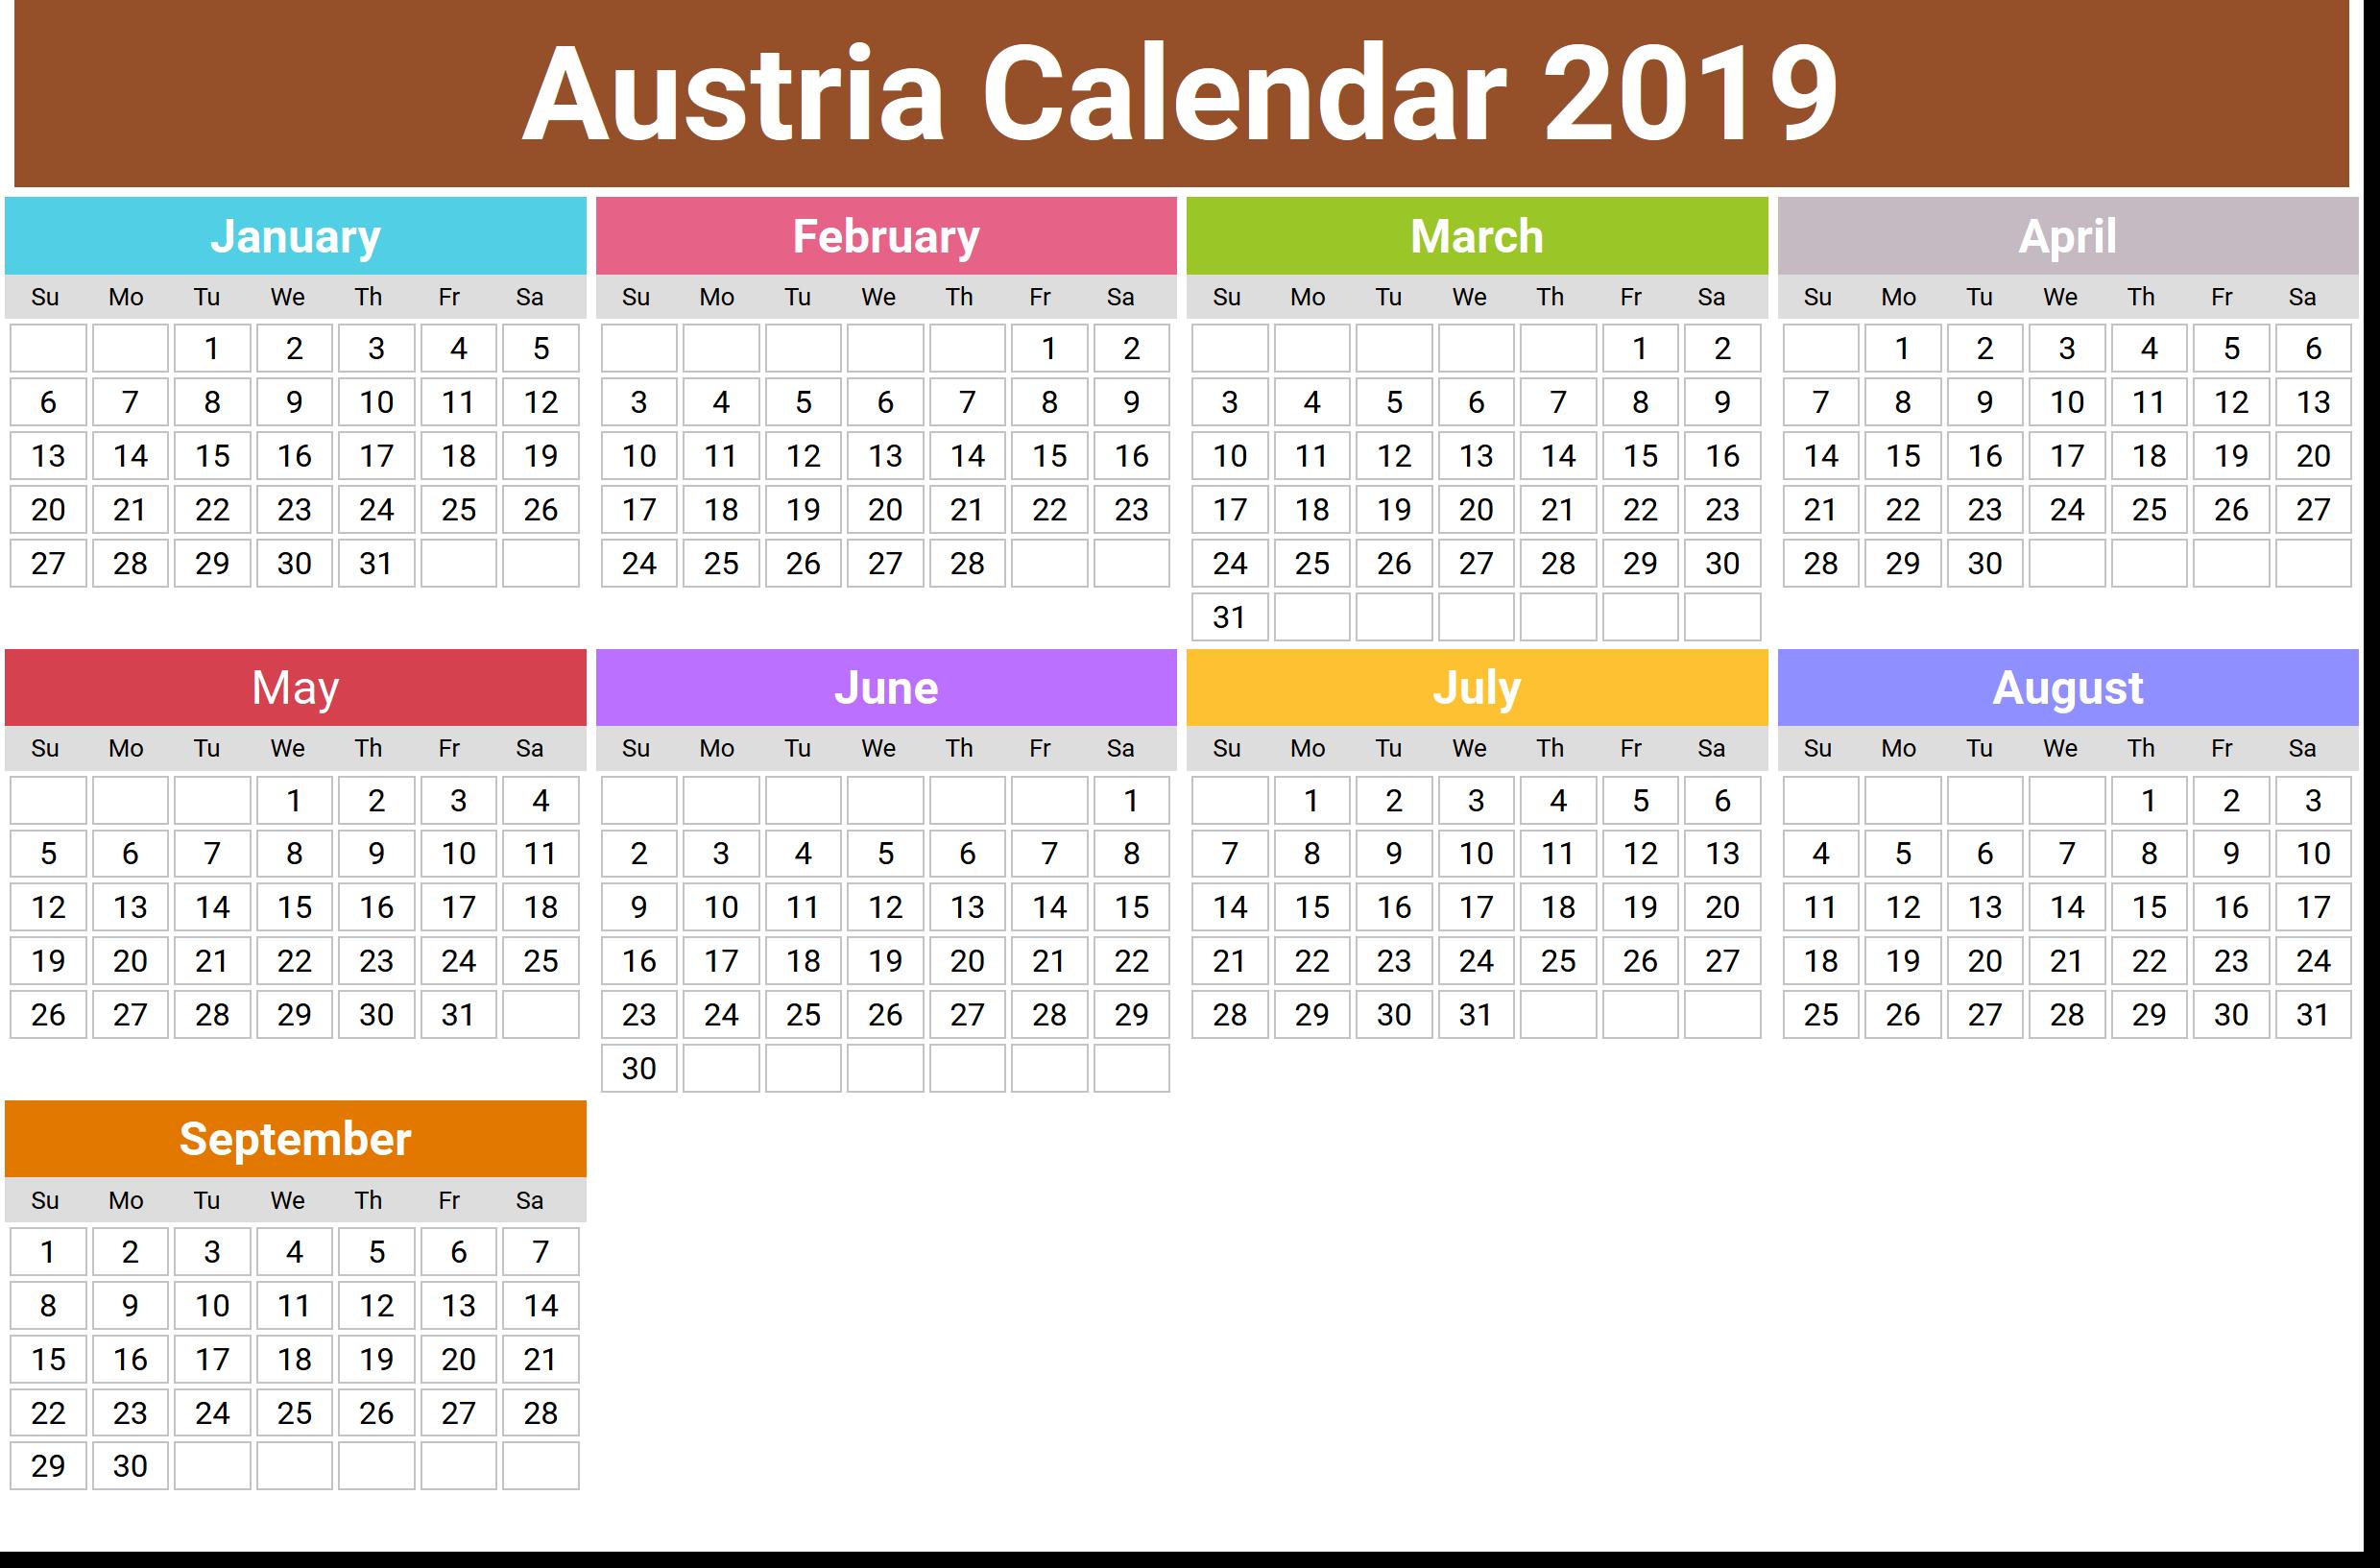 Austria Calendar 2019 Printable